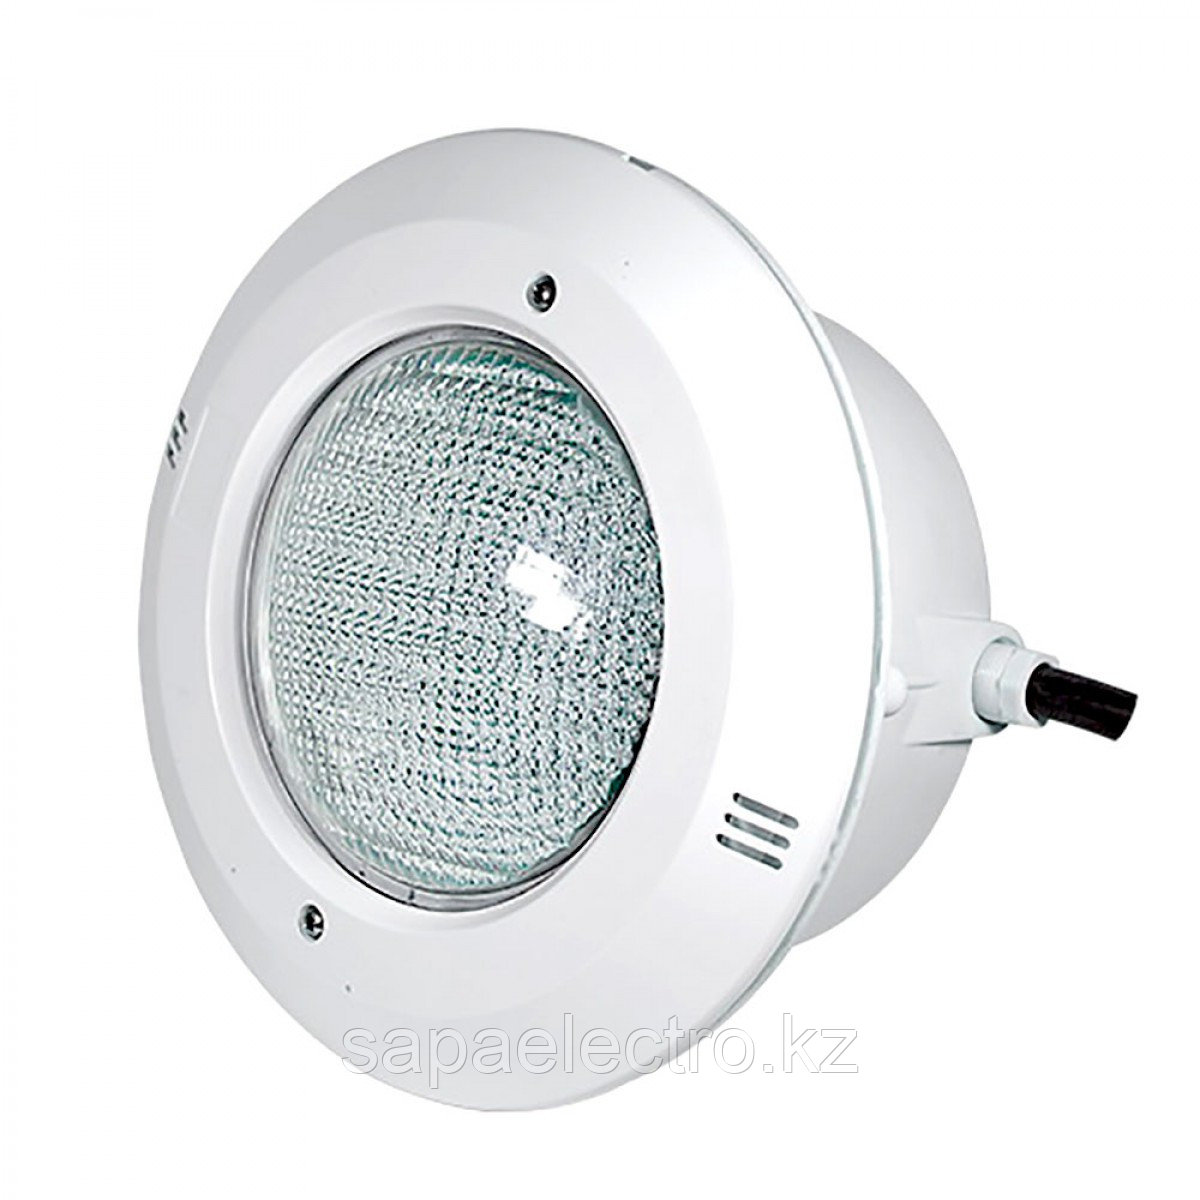 Подвод.LH 5001-1 12V/300W WH +лампа(PAR56) (TS)4шт